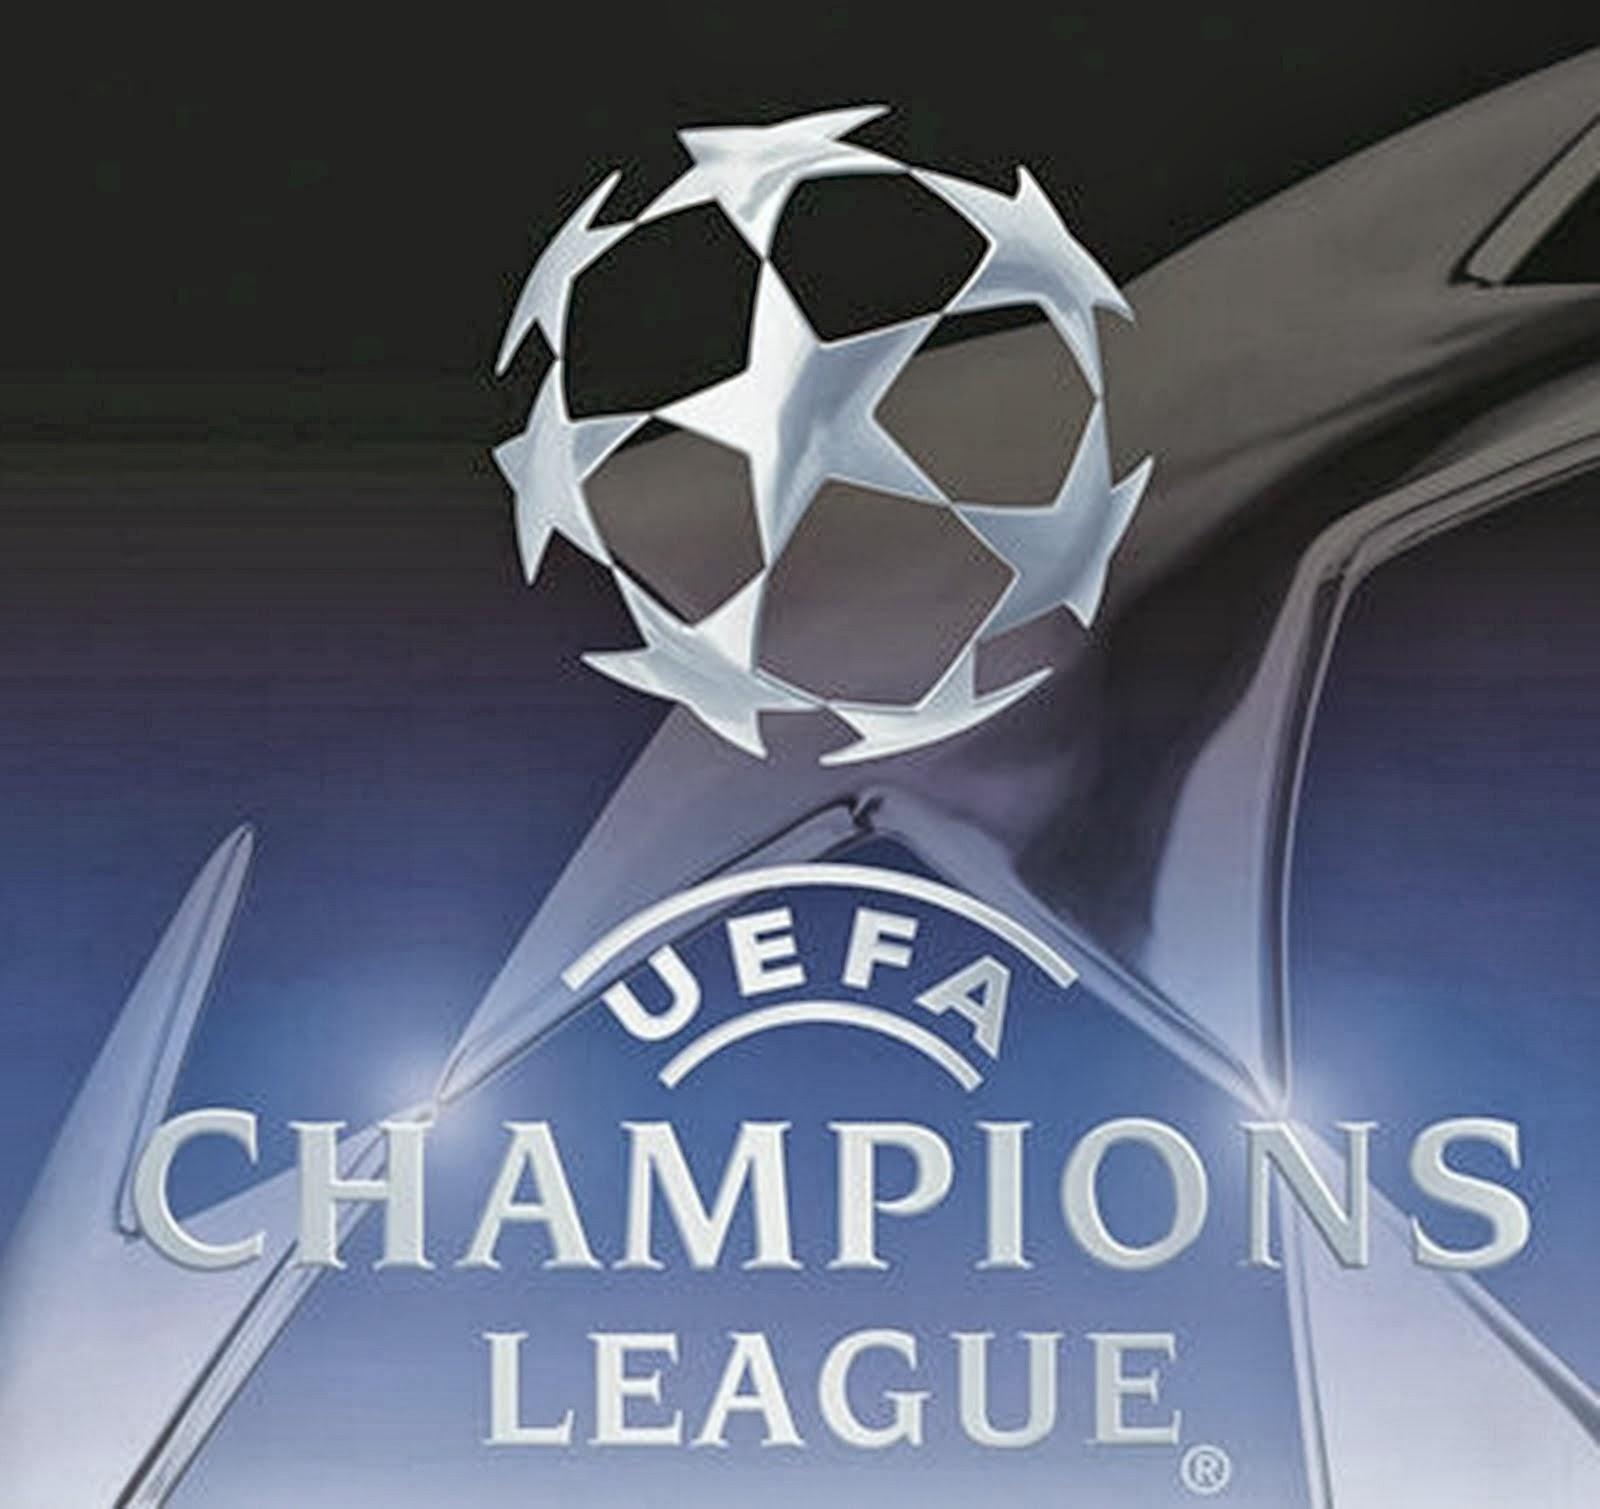 Uefa Logo 2013 very popular uefa cham...